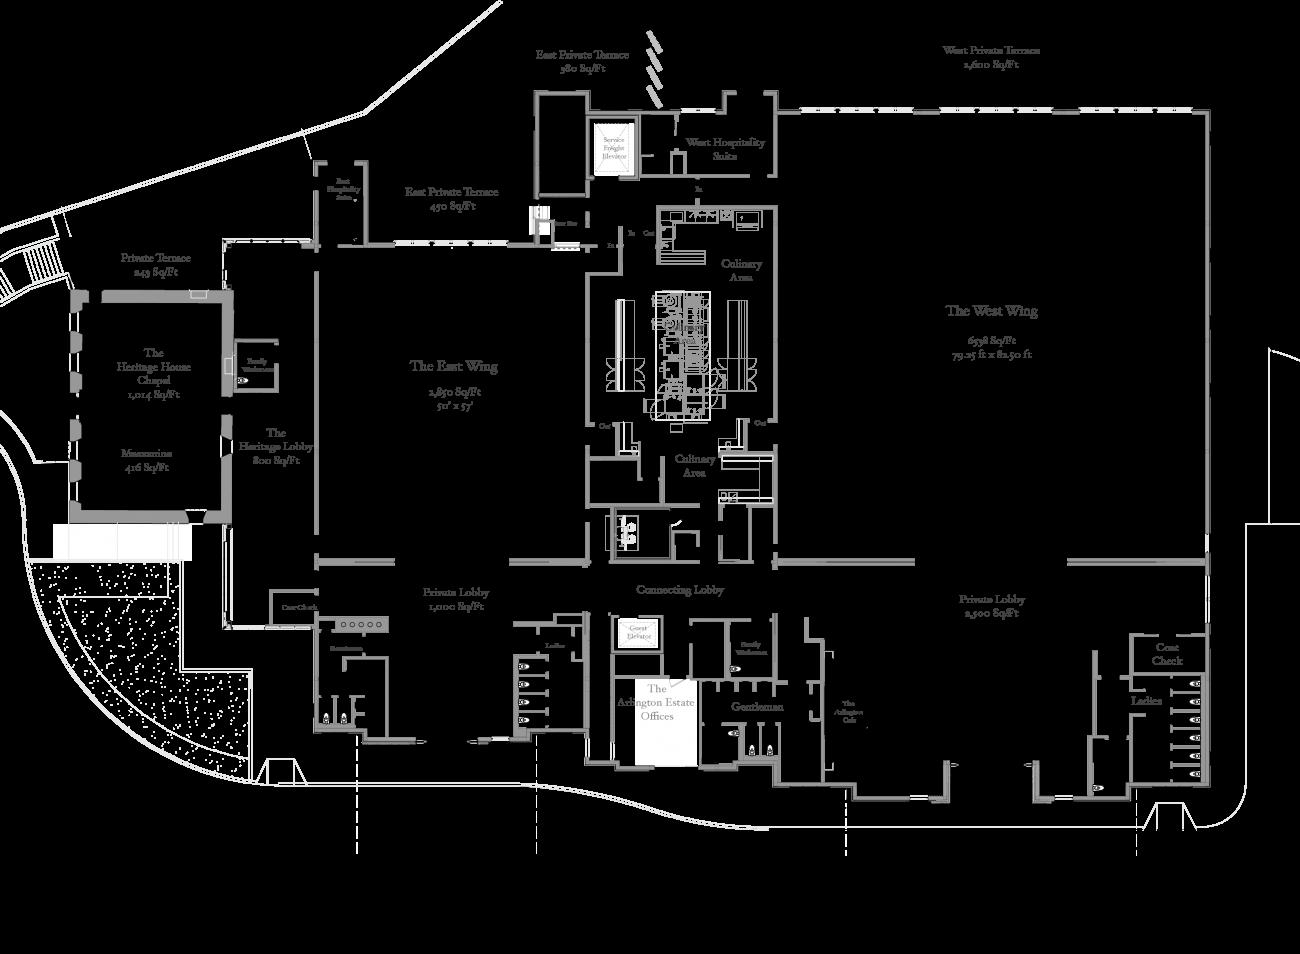 Floorplan of the entire estate